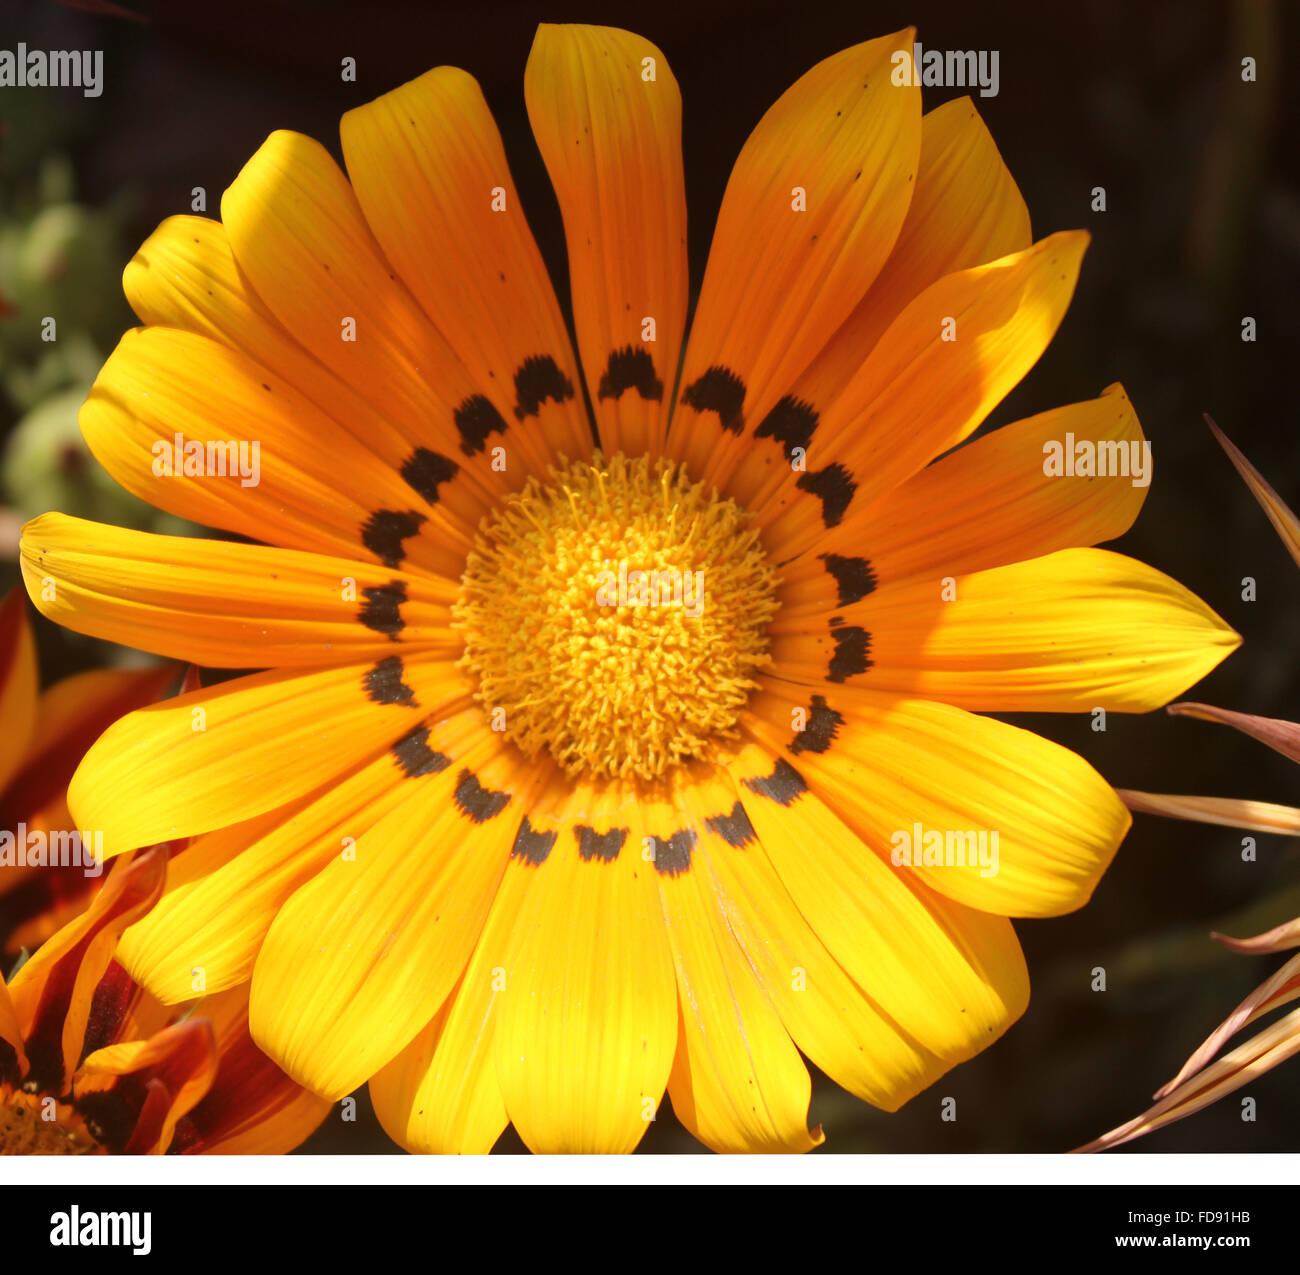 Gazanien Ringens 'Talent Orange', Blätter kultiviert ornamentale Kraut mit silbrig behaart im basalen Stockbild